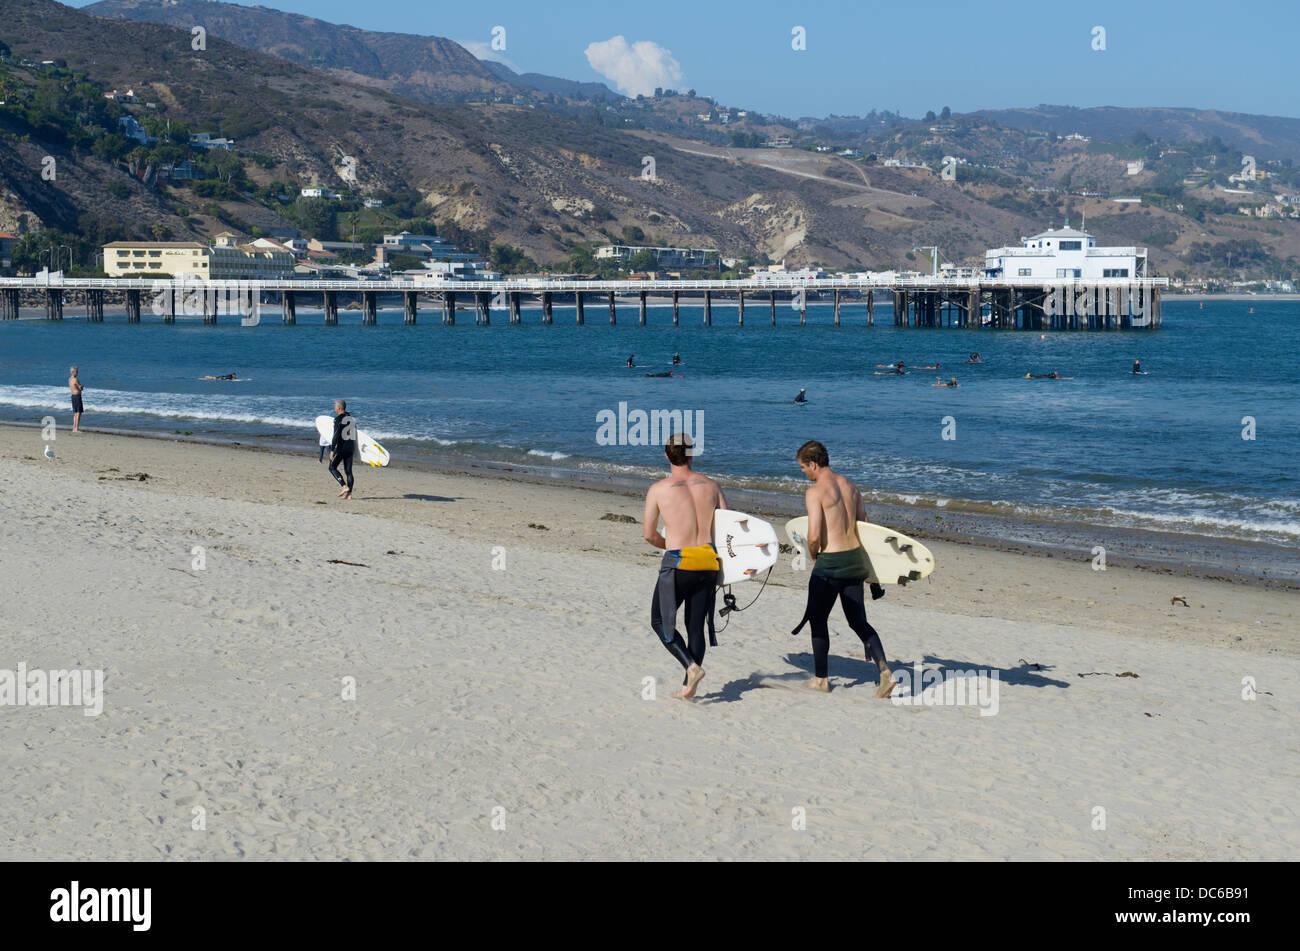 Men walking with surfboards, Surfrider Beach, Malibu, CA Stock Photo